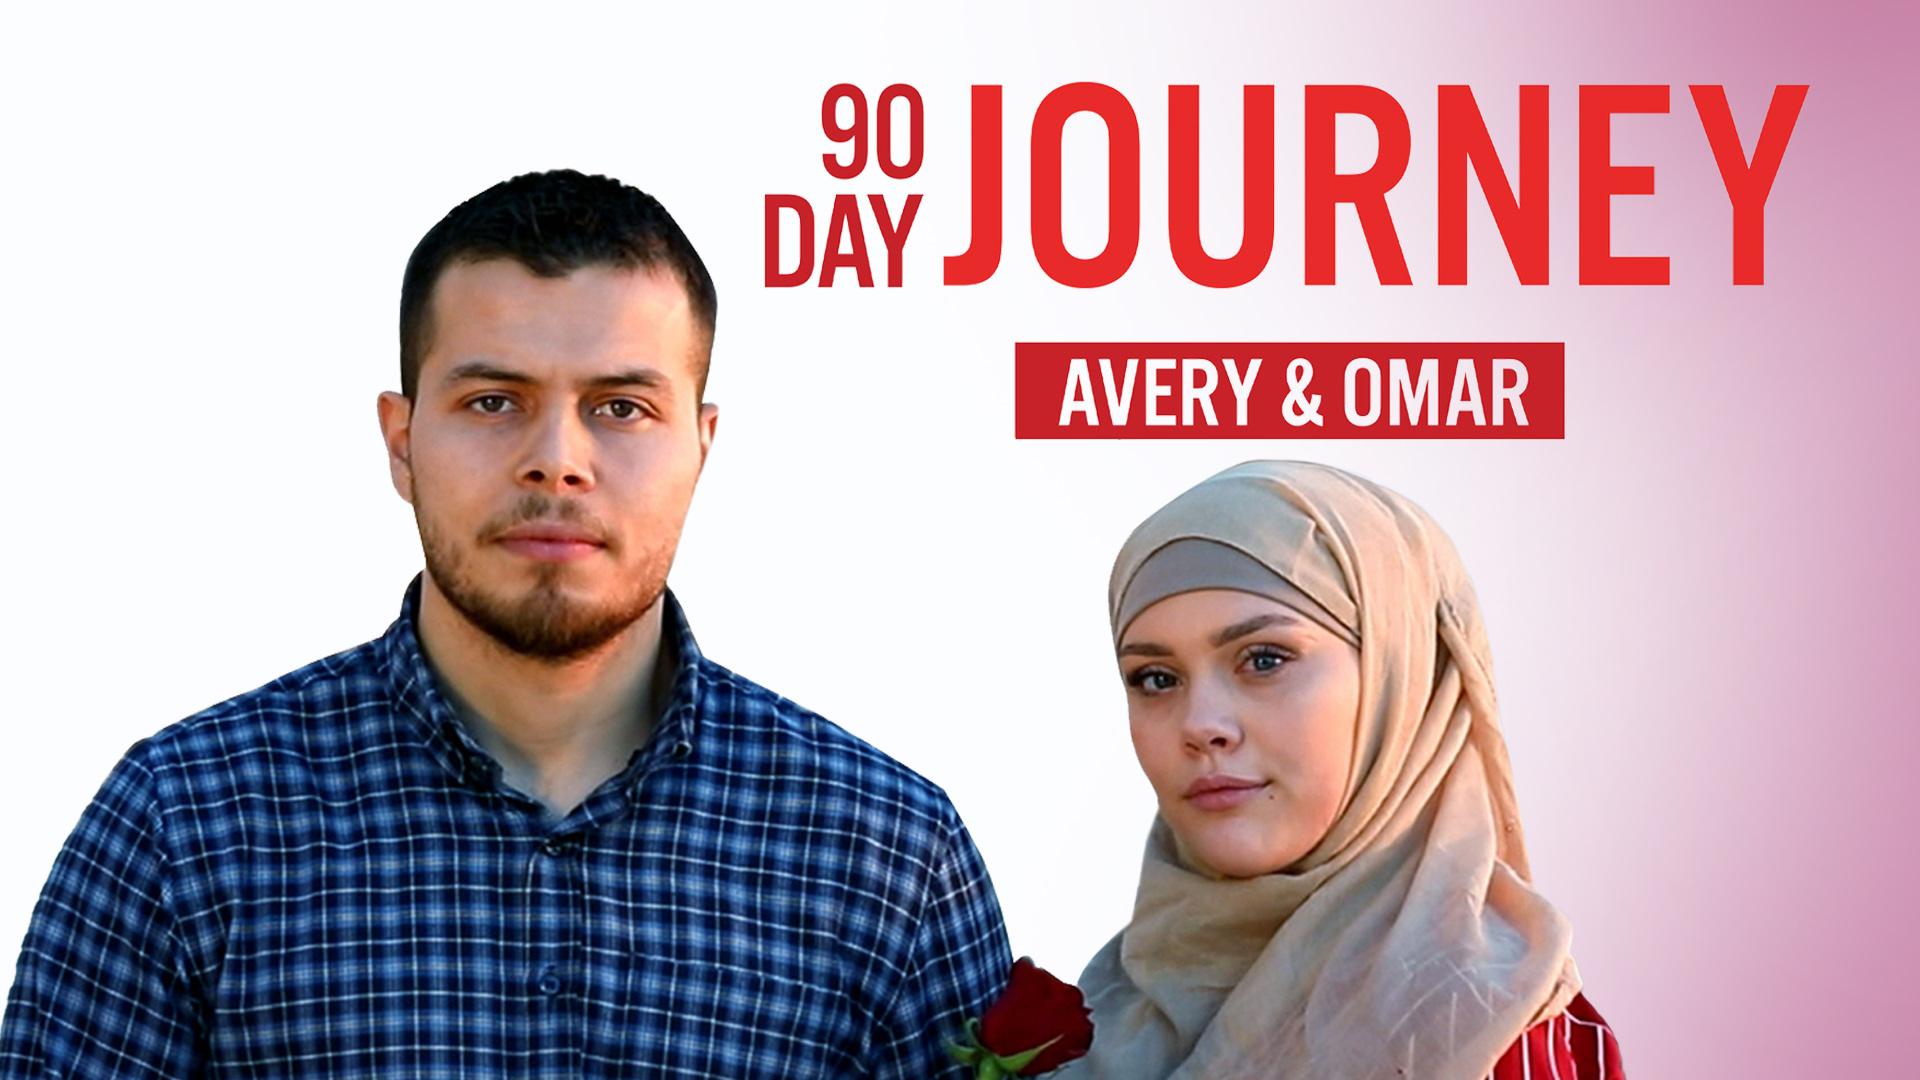 90 Day Journey: Avery & Omar - Season 1